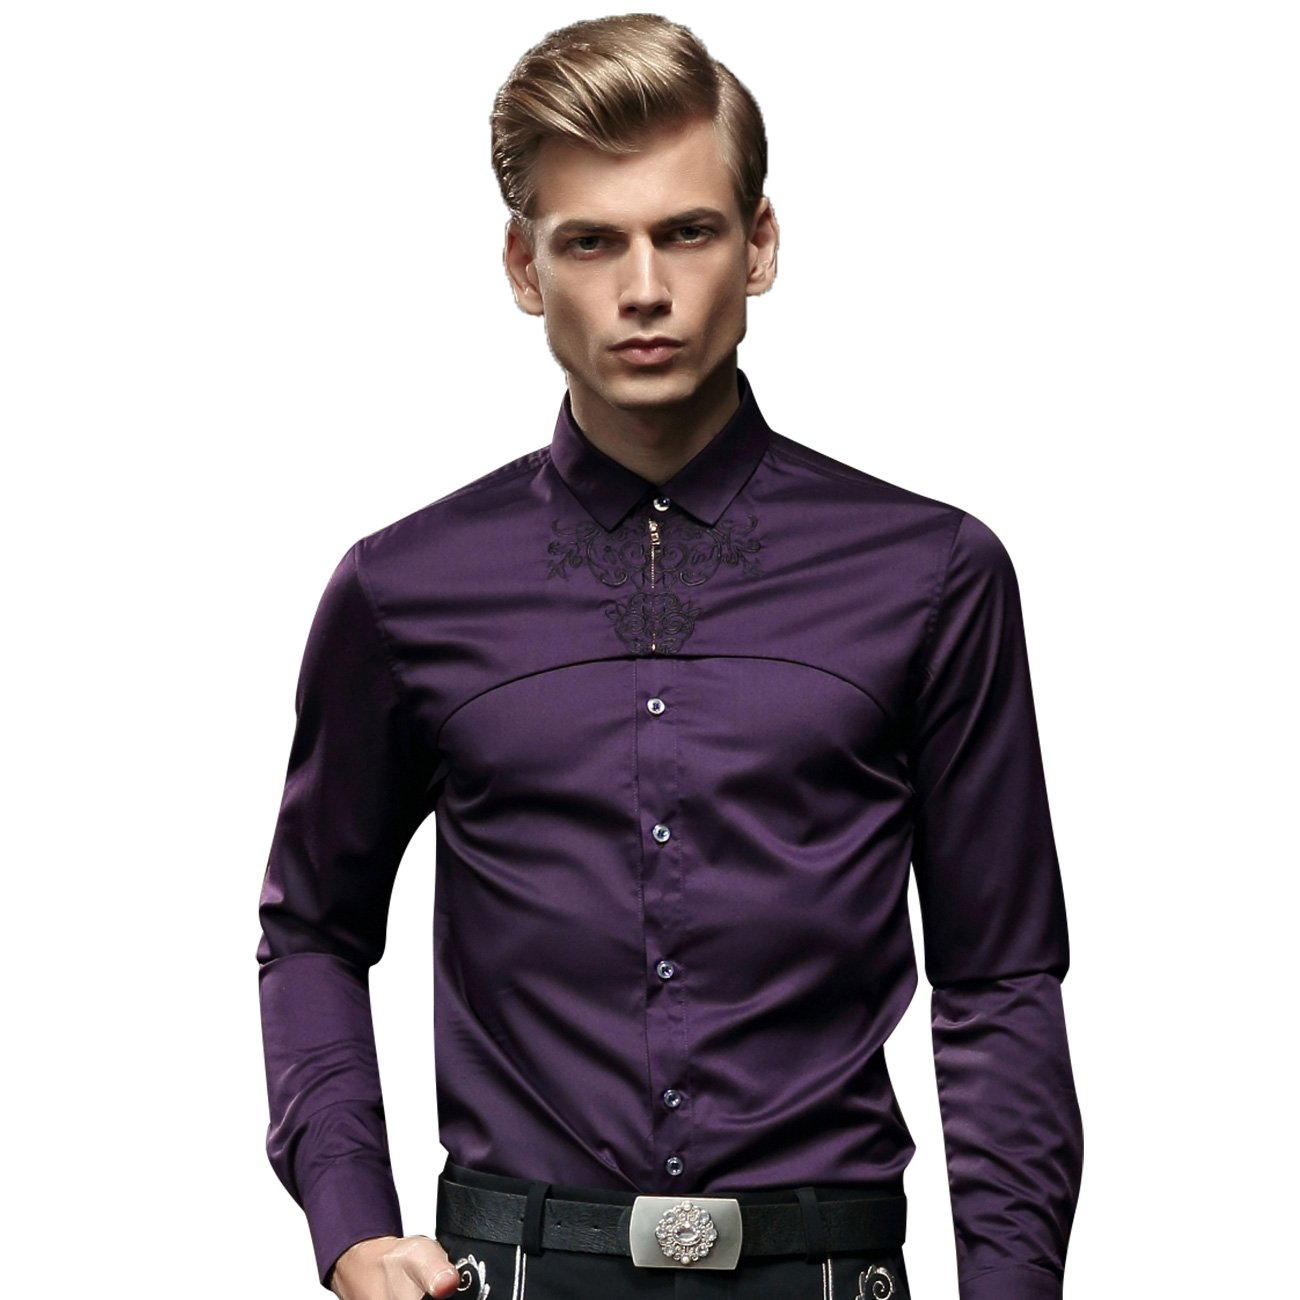 Fanzhuan Purple Designer Shirt Long Sleeve Slim Fit Party Dress